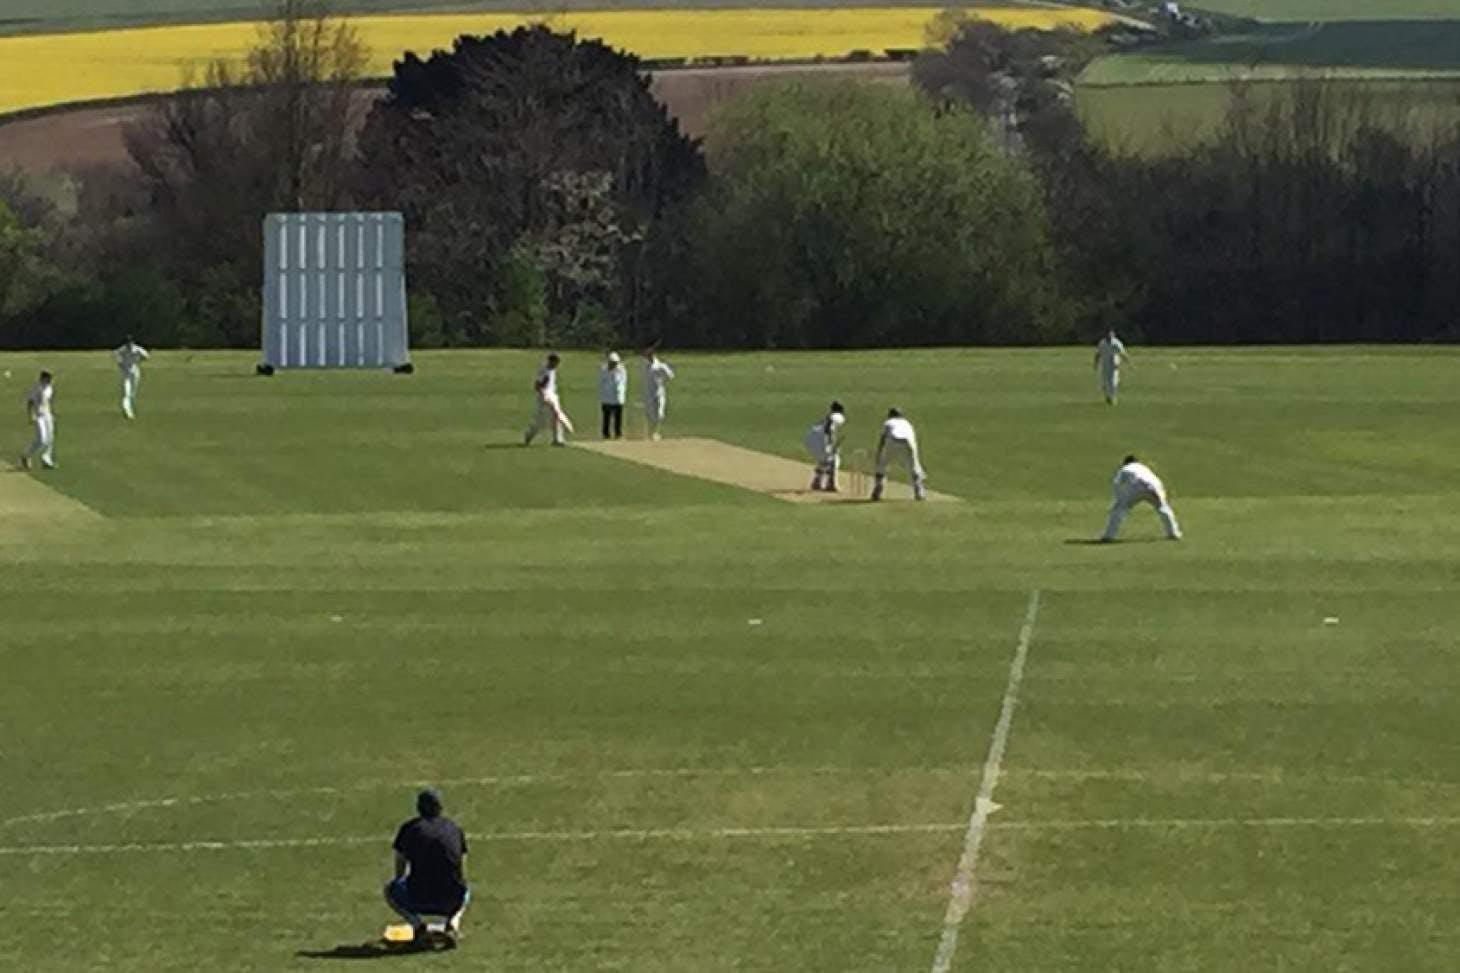 Falmer Sports Complex Full size | Grass cricket facilities